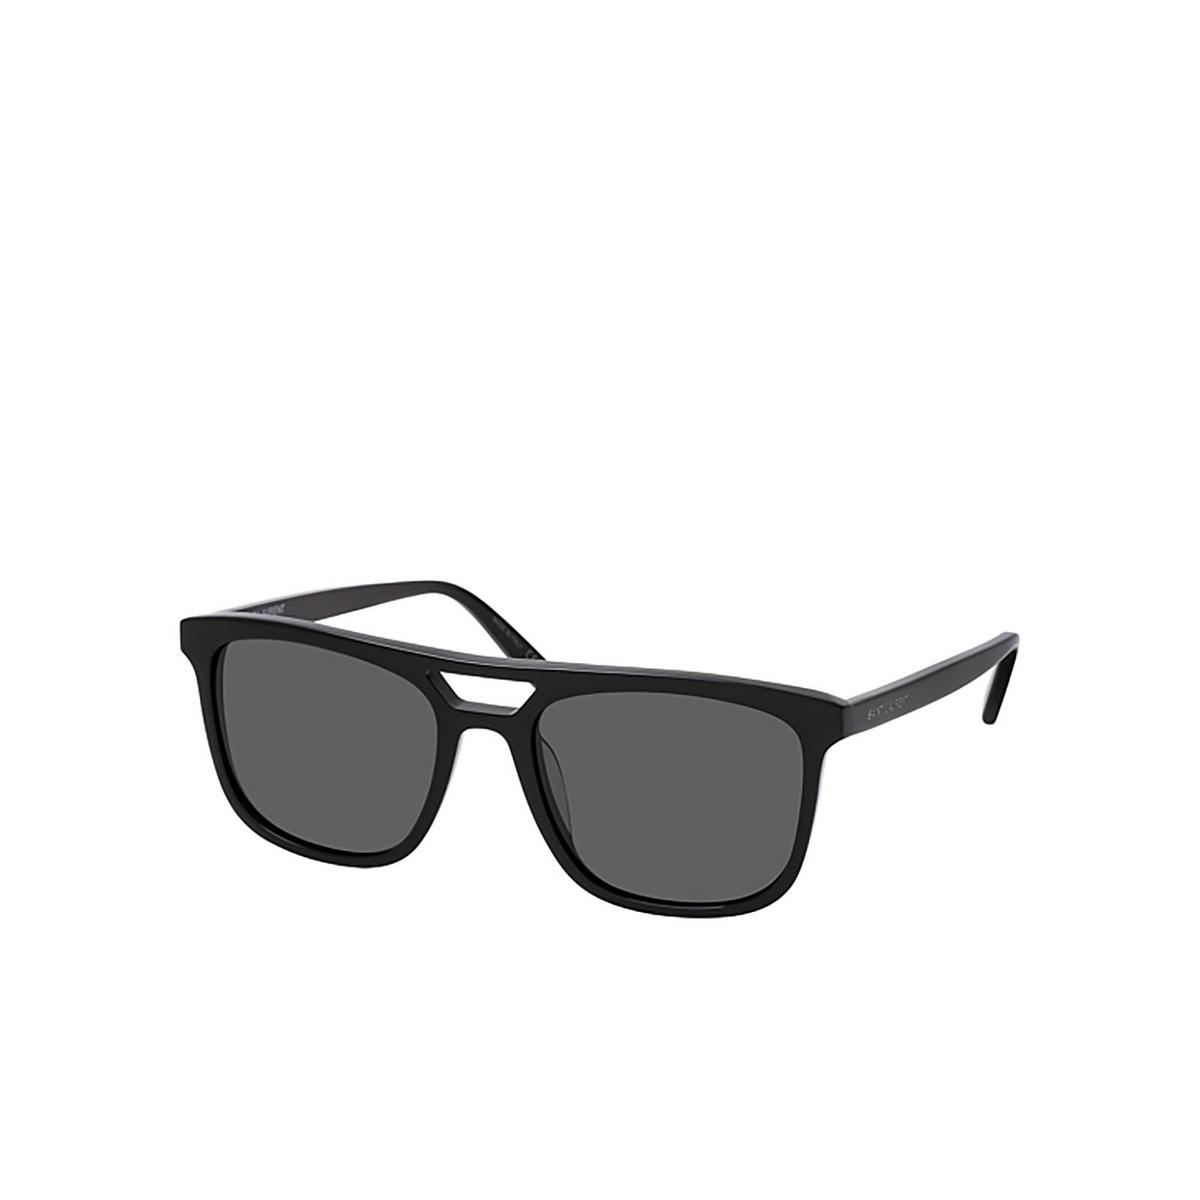 Saint Laurent® Square Sunglasses: SL 455 color Black 001 - three-quarters view.